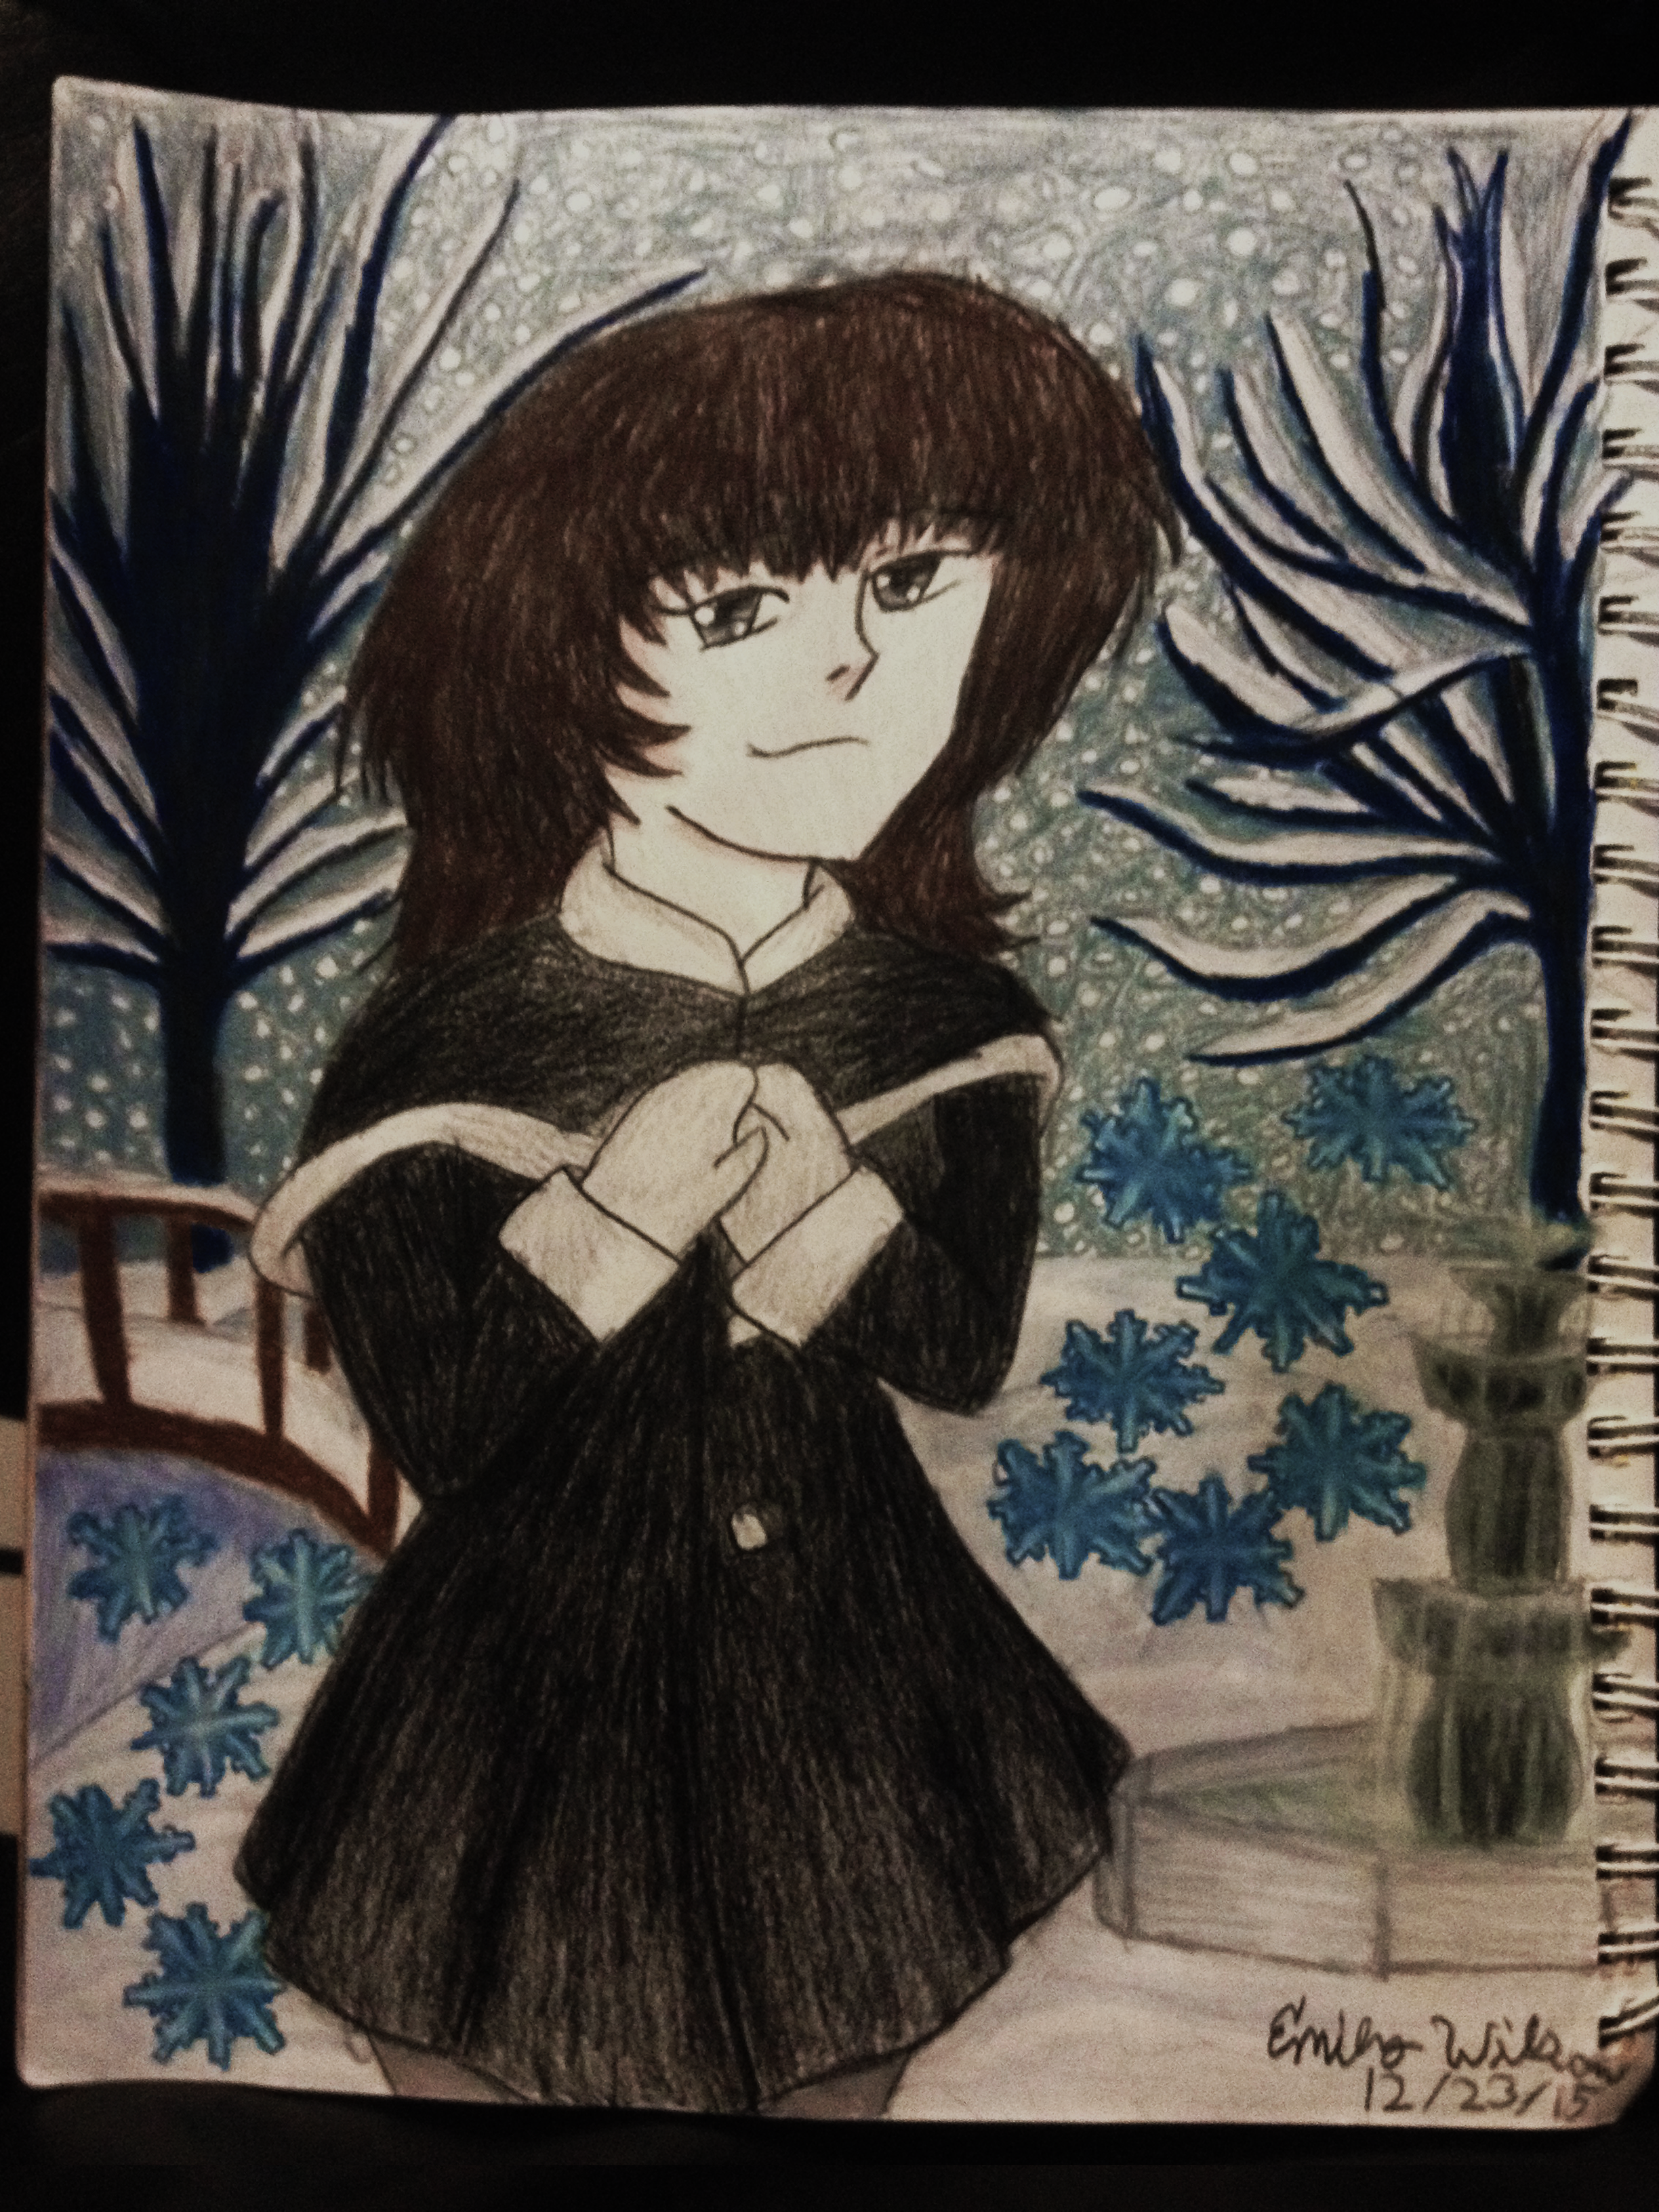 Sketchbook Drawing 19 - Beginning of Winter!